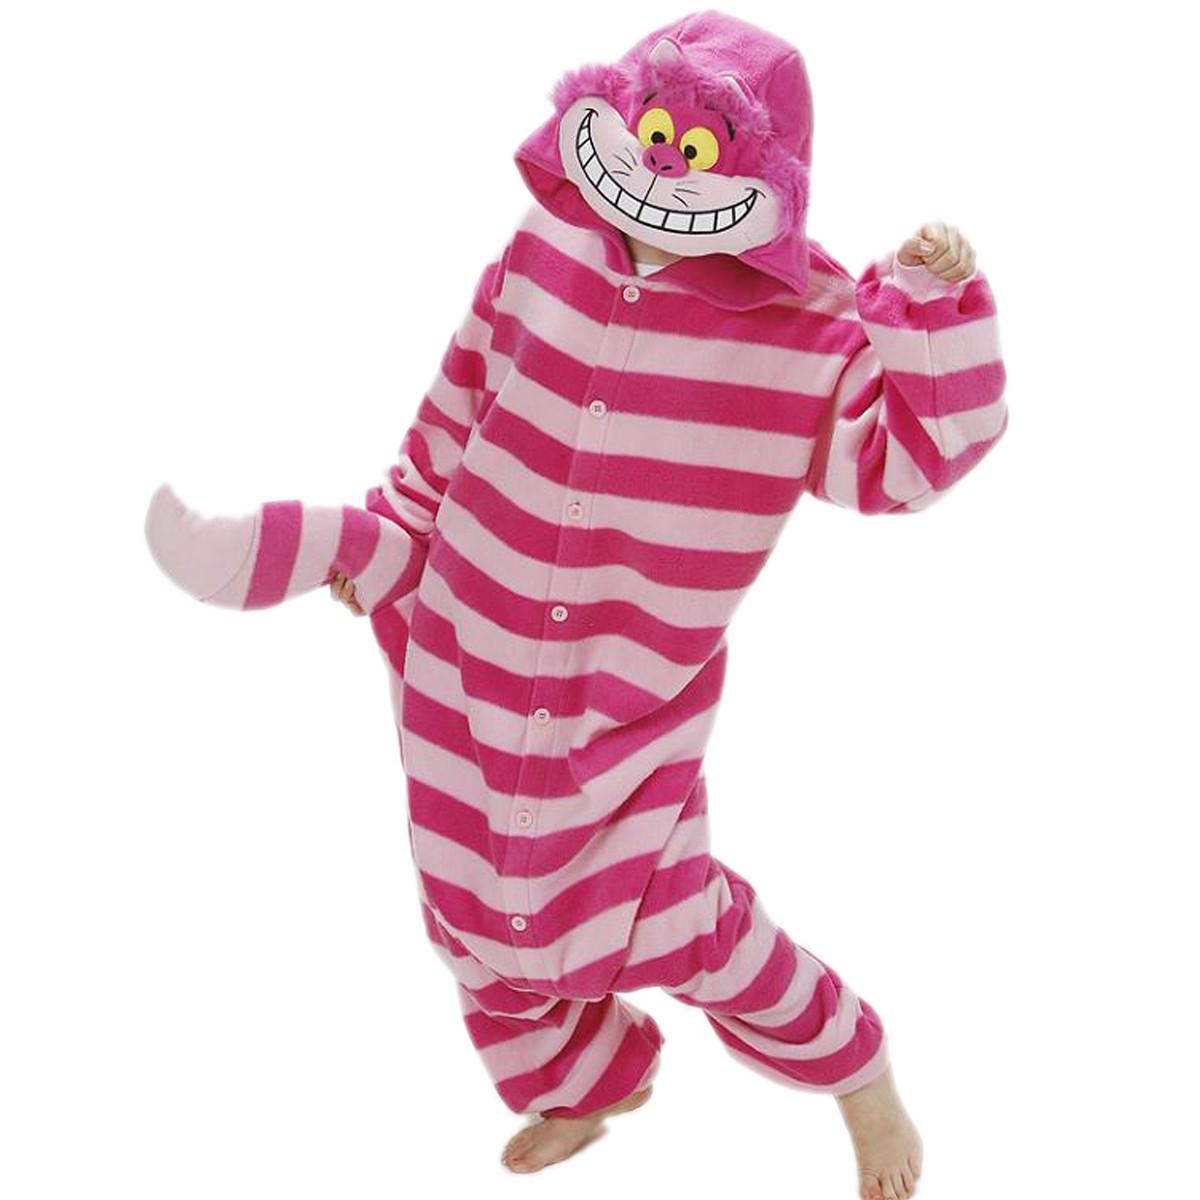 6ce68e9d0 Cheshire Cat Onesie Unisex Women & Men Animal Kigurumi Pajama Halloween  Party Costumes